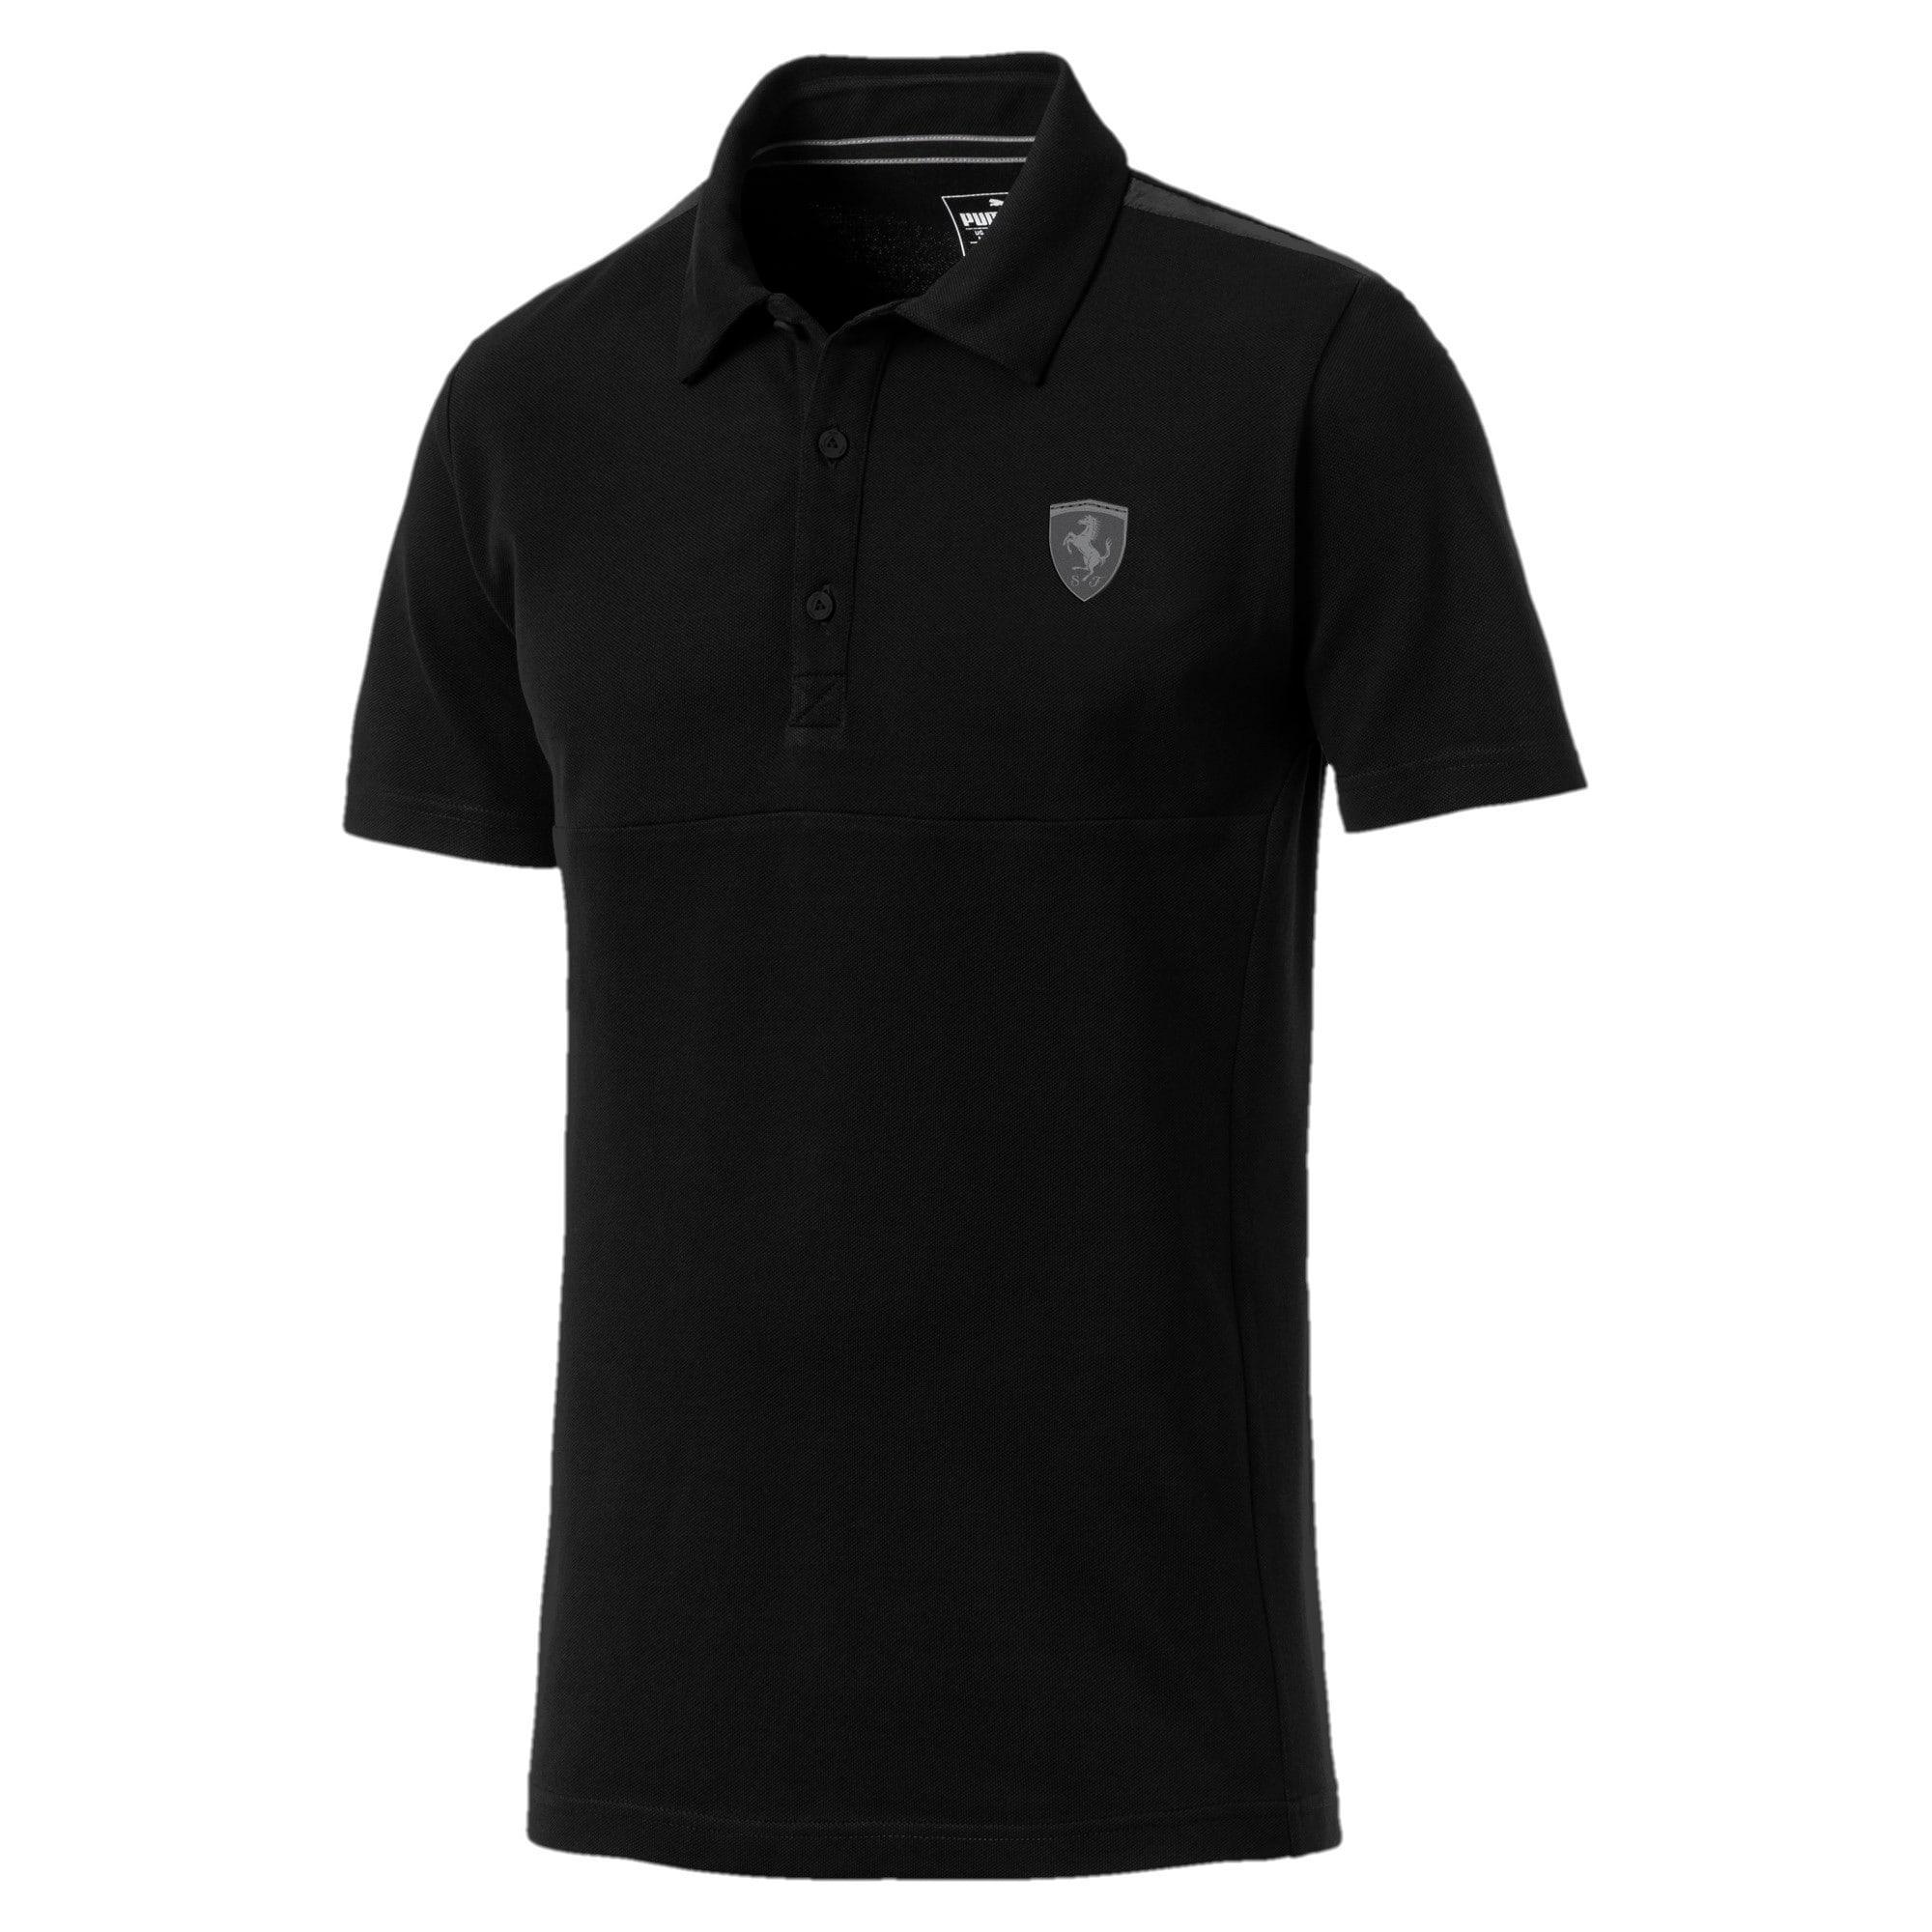 Thumbnail 1 of Ferrari Men's Polo Shirt, Puma Black, medium-IND